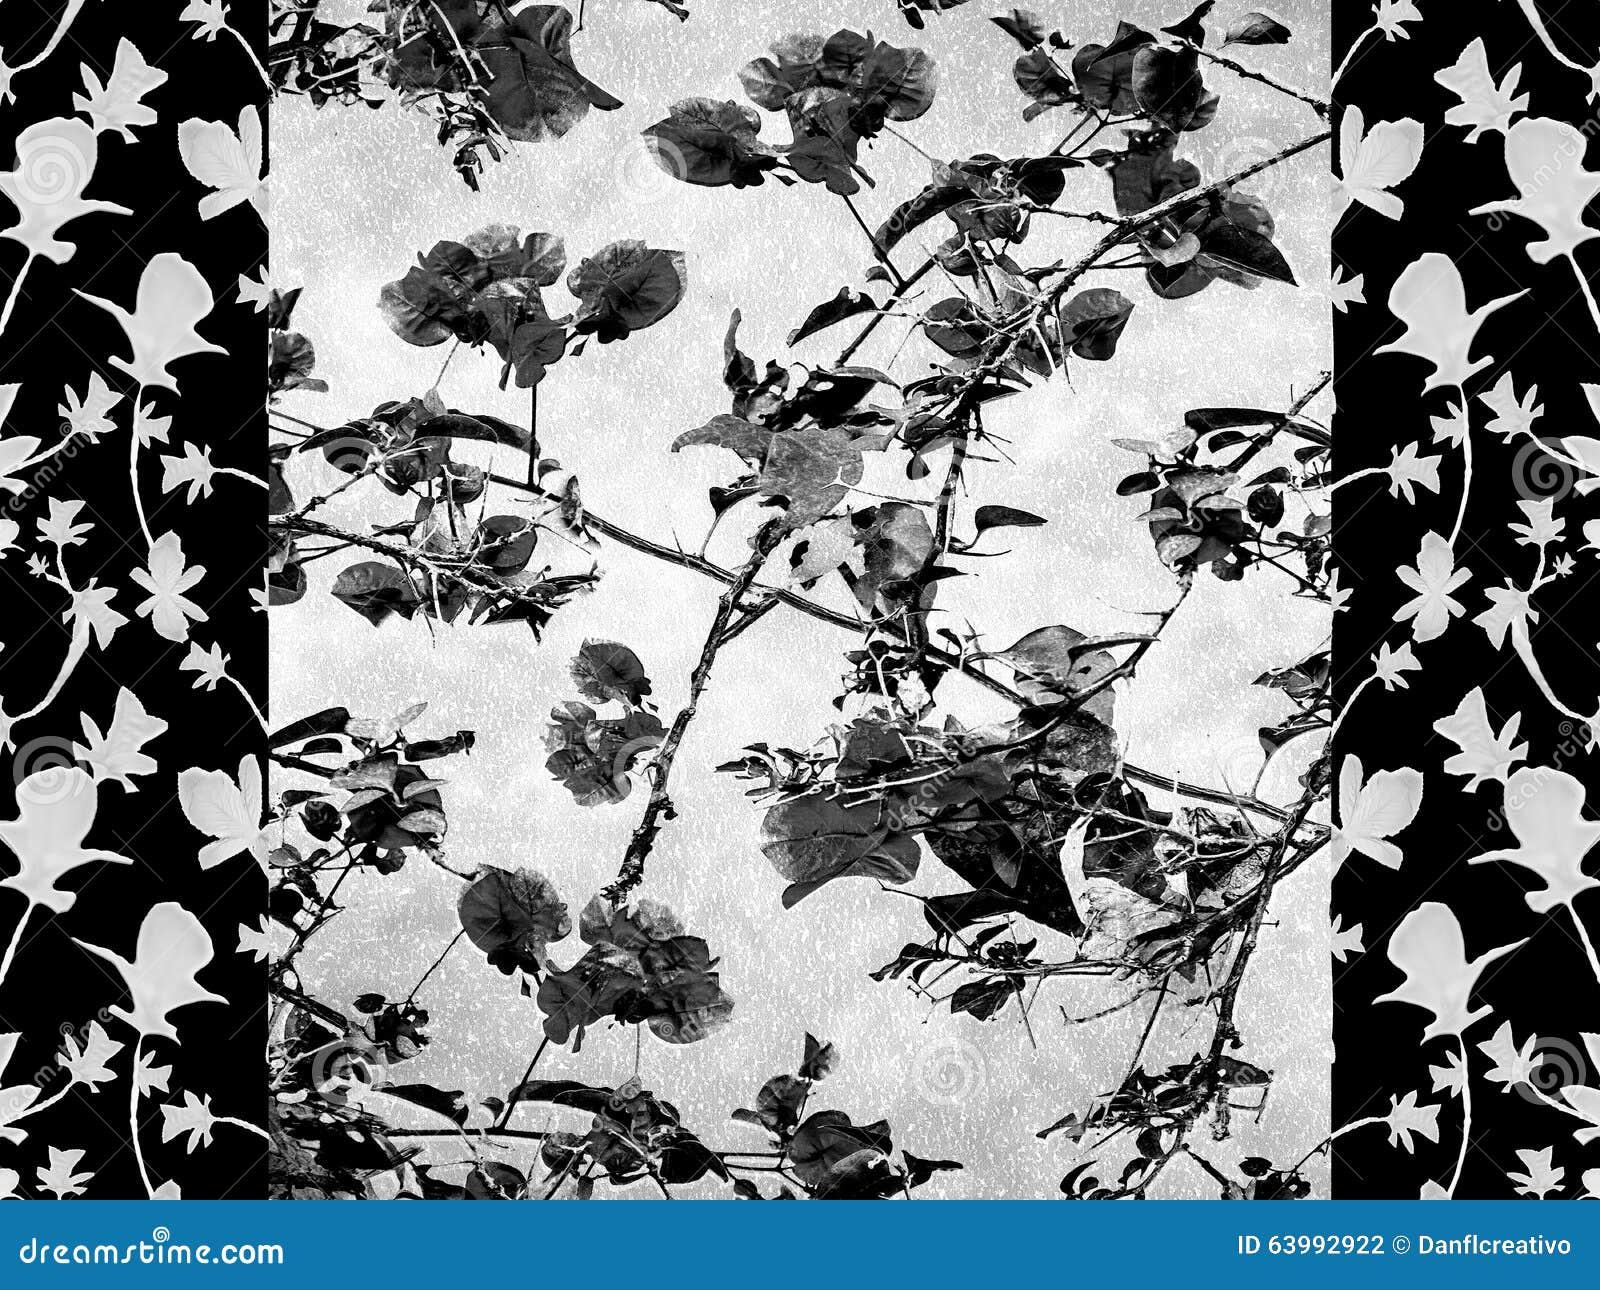 Oriental Striped Floral Collage Stock Illustration - Illustration of ...